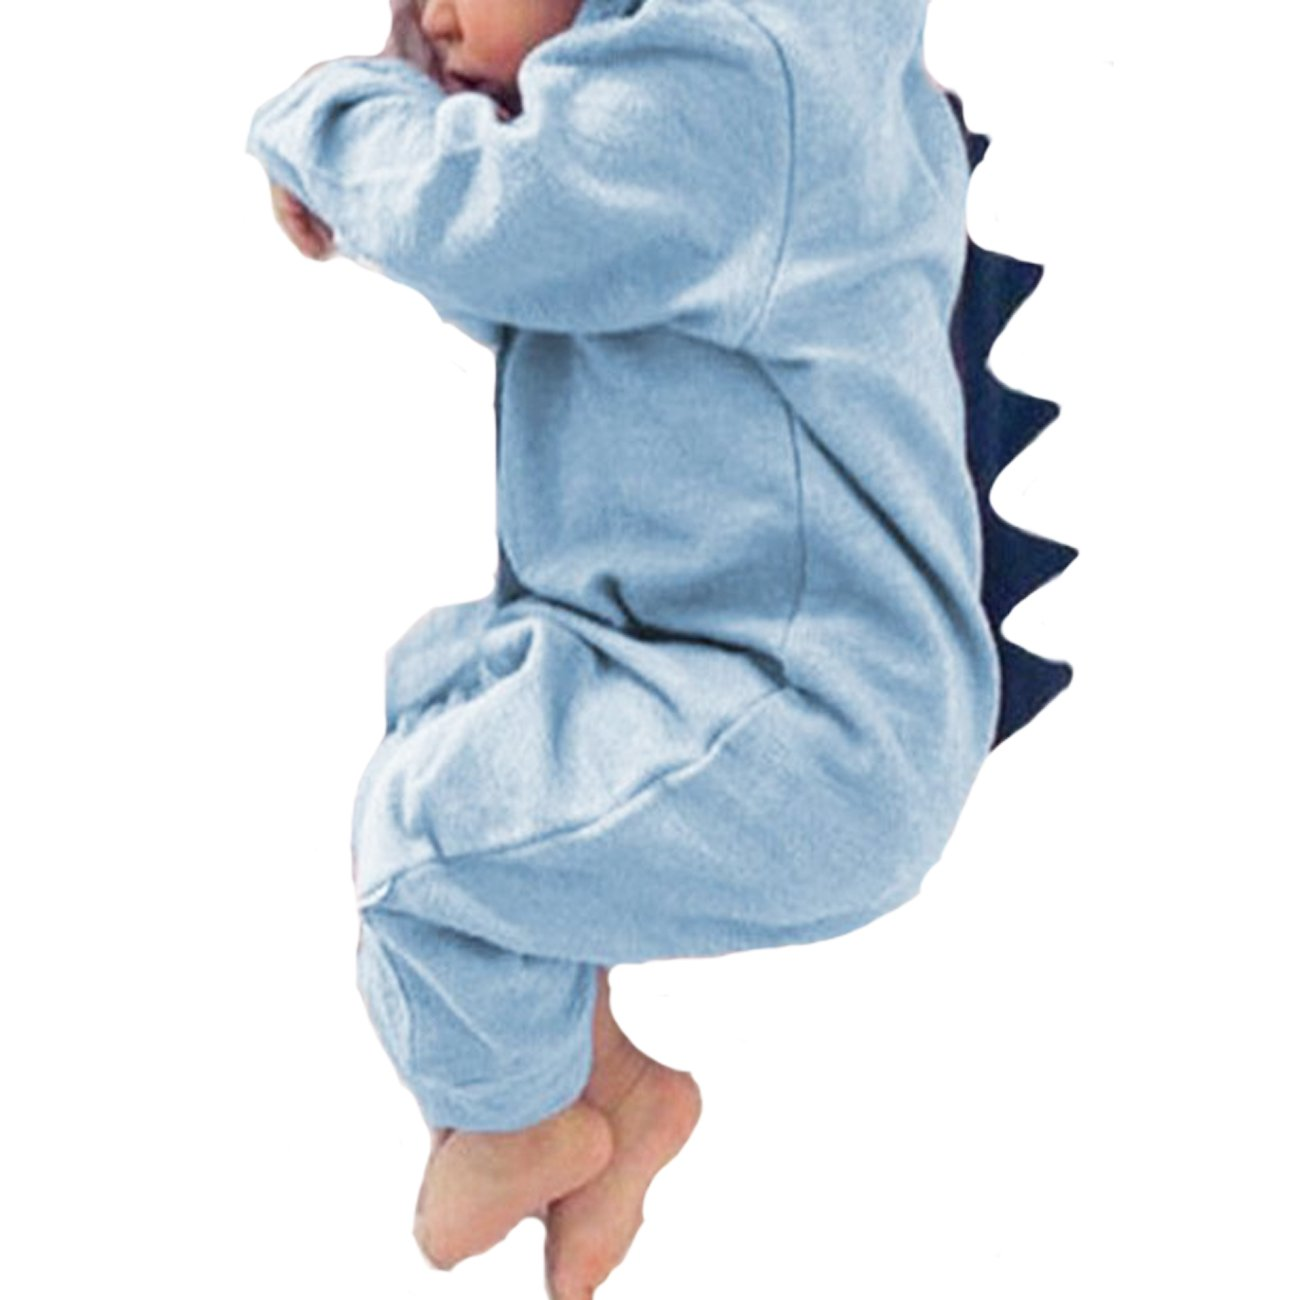 DRESHOW BQUBO Baby Cartoon Onesies Disnosaur Romper Long Sleeve One-Piece Jumpsuit (Light Blue/Button Front, 3-6)